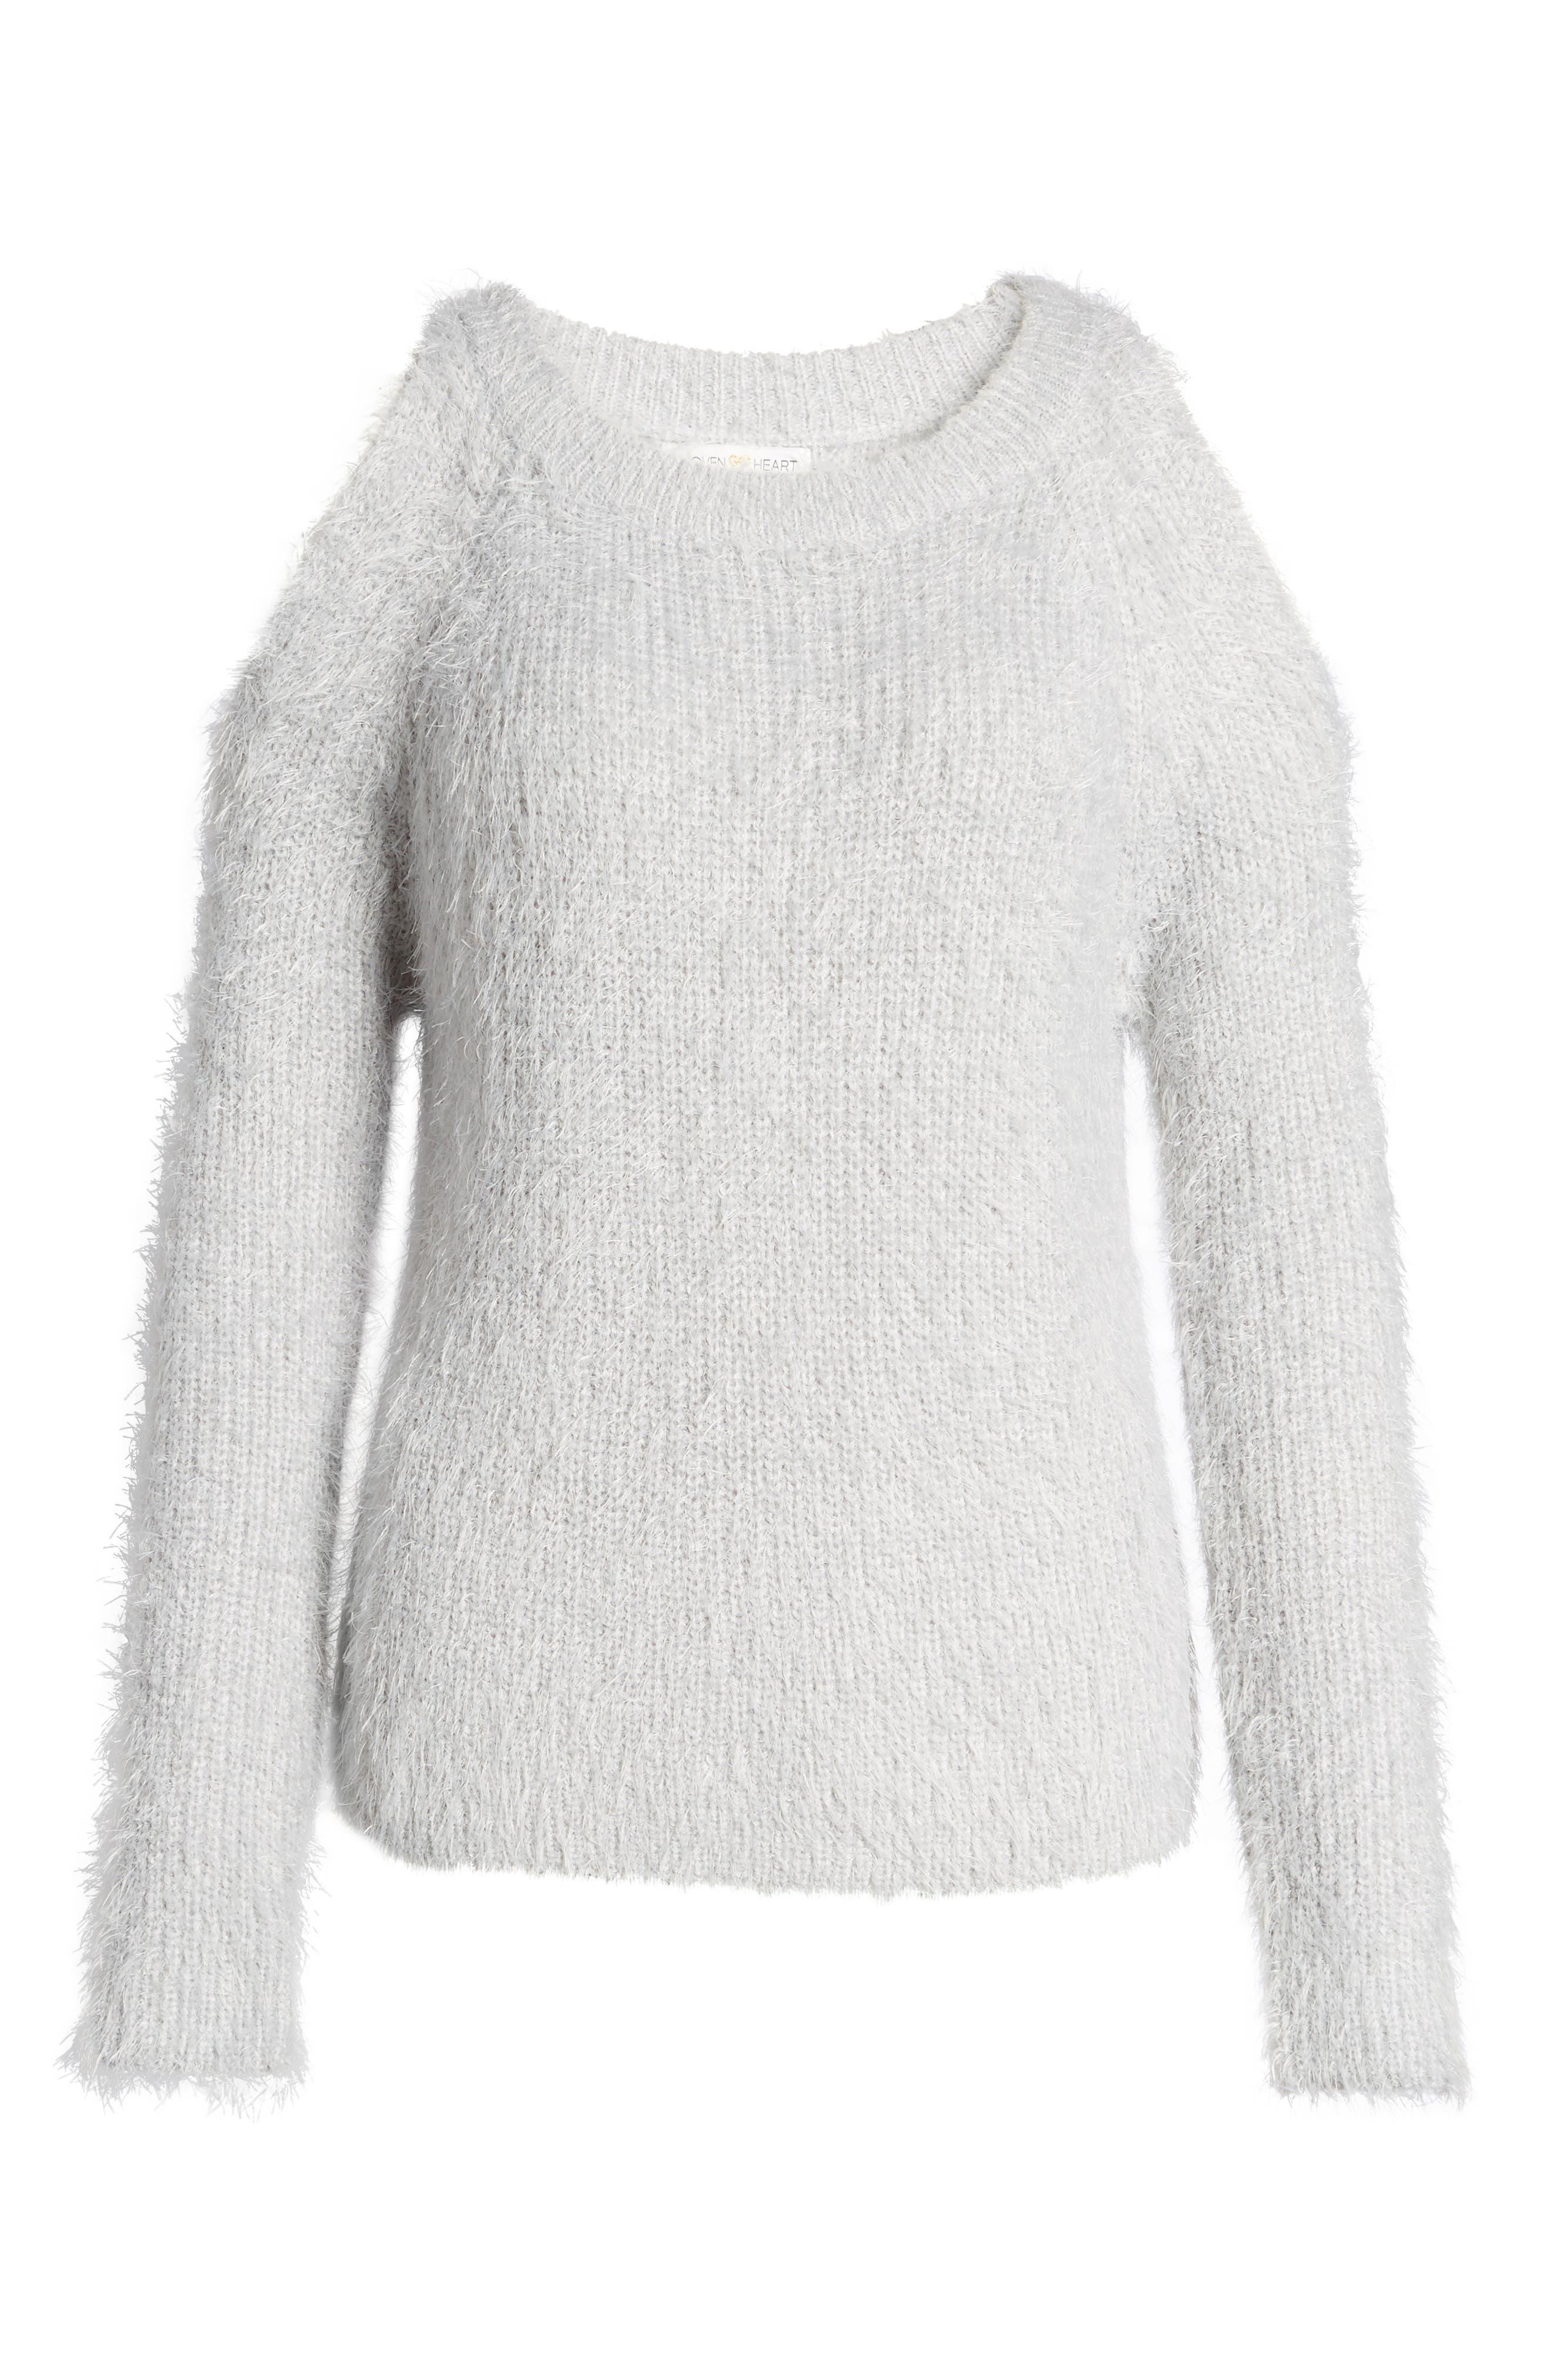 Cold Shoulder Sweater,                             Alternate thumbnail 6, color,                             Light Purple Grey